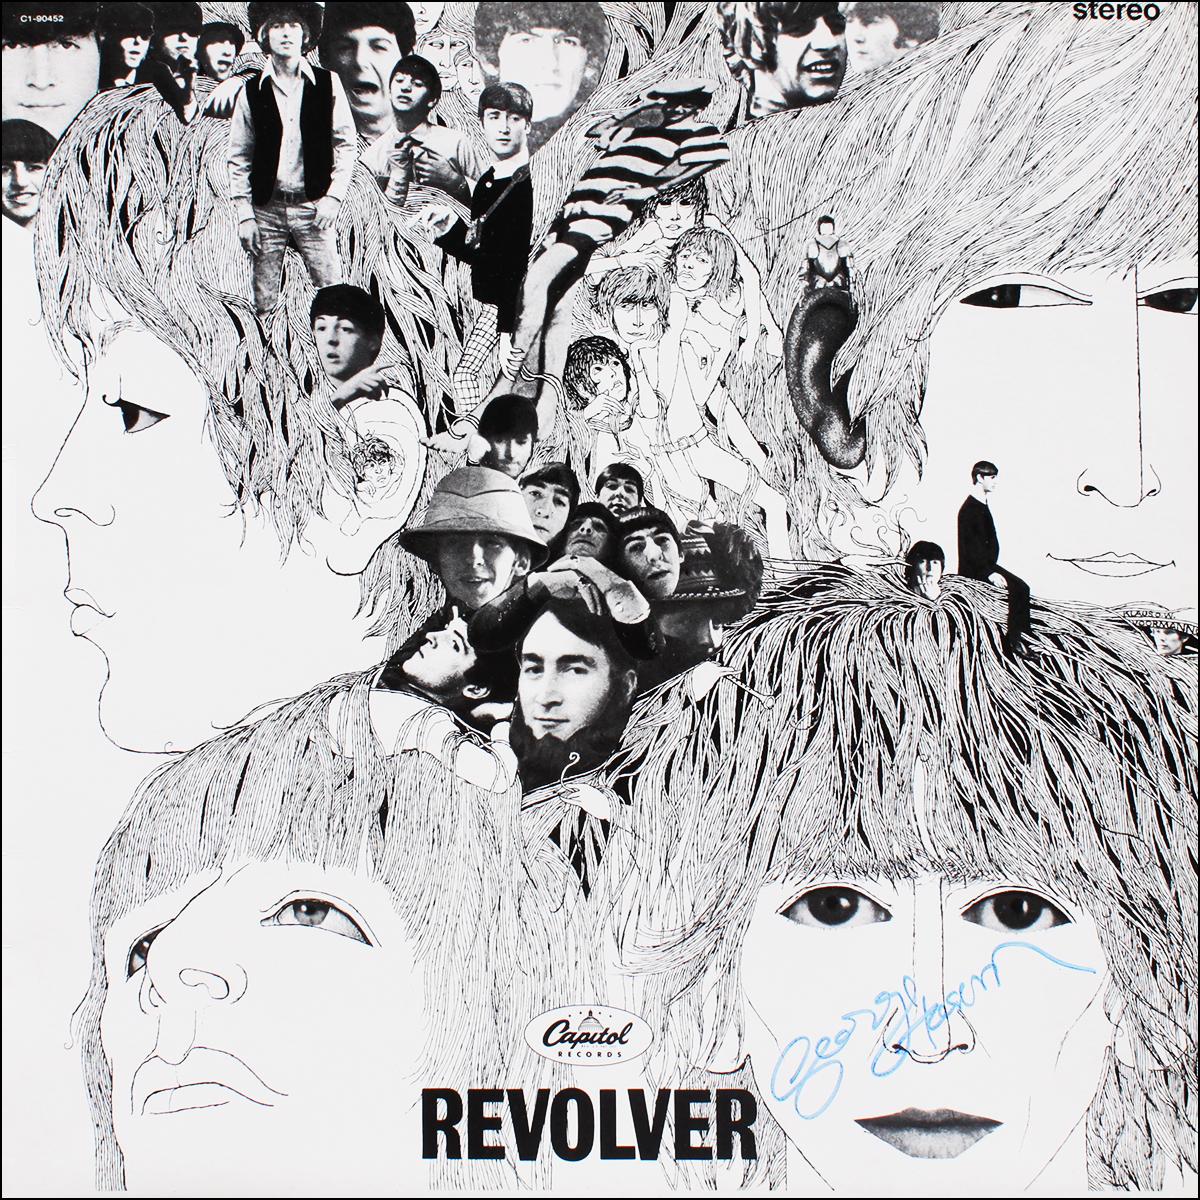 LP - Beatles - George Harrison - Revolver